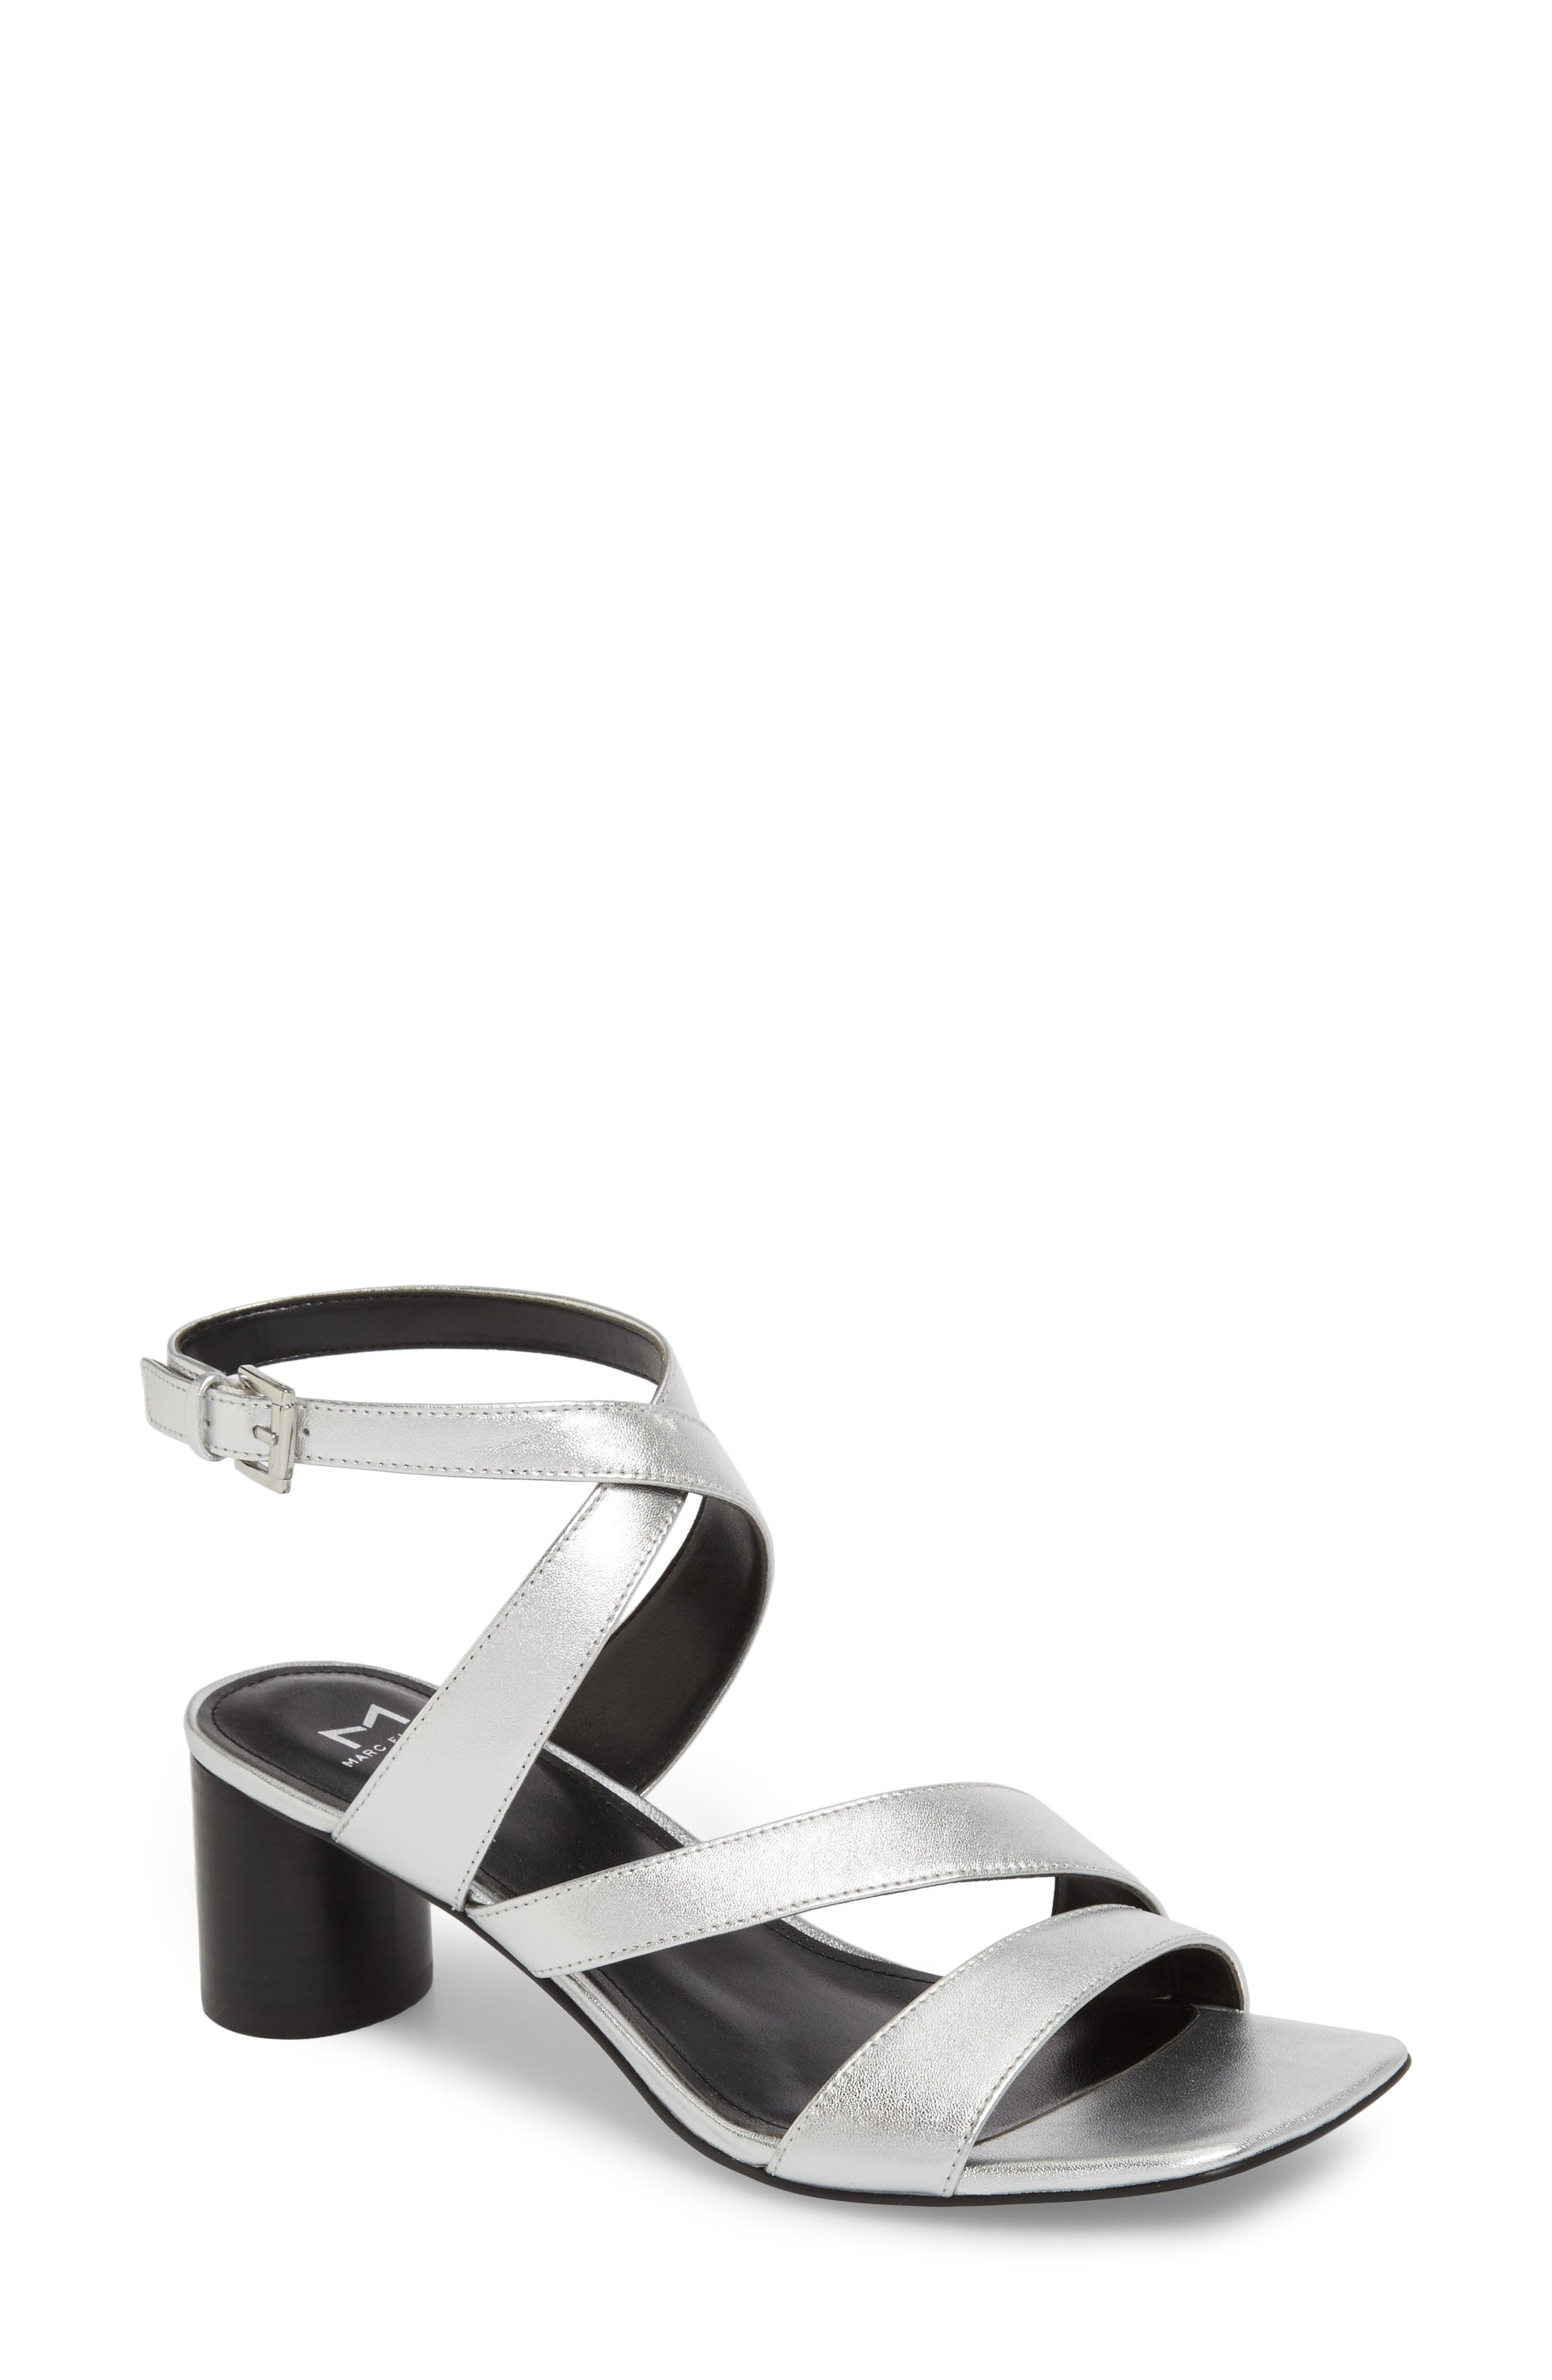 Marc Fischer LTD Idana Strappy Sandal,                         Main,                         color, Silver Leather